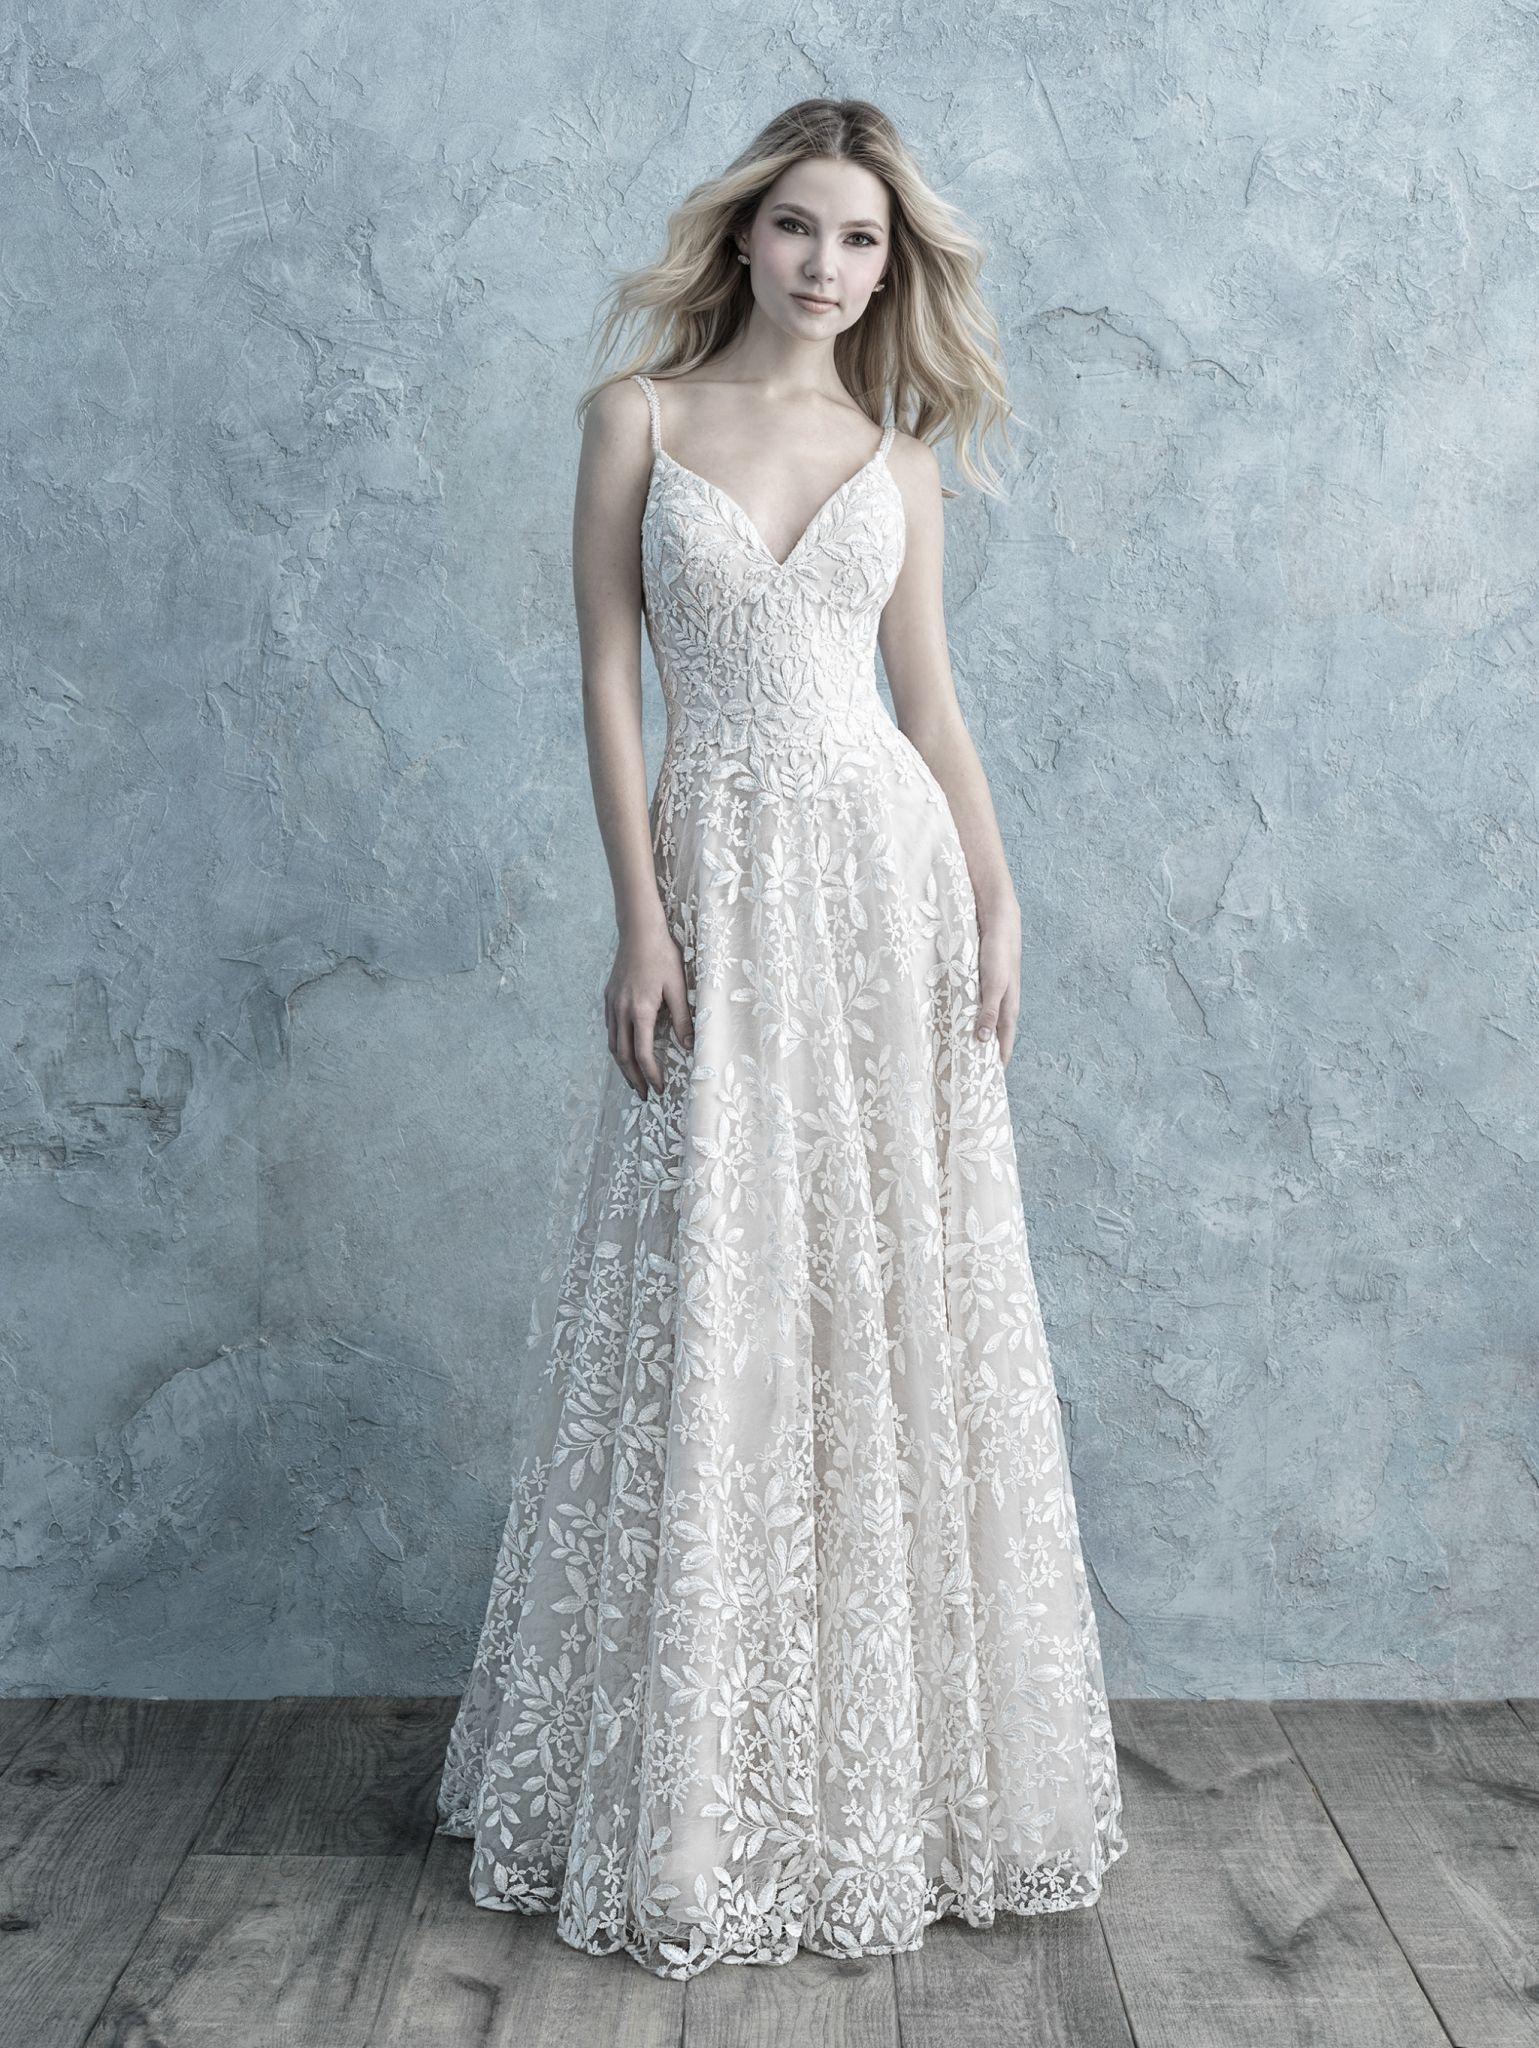 Allure Style 9669 Allure Wedding Dresses Allure Bridal Wedding Dress Store